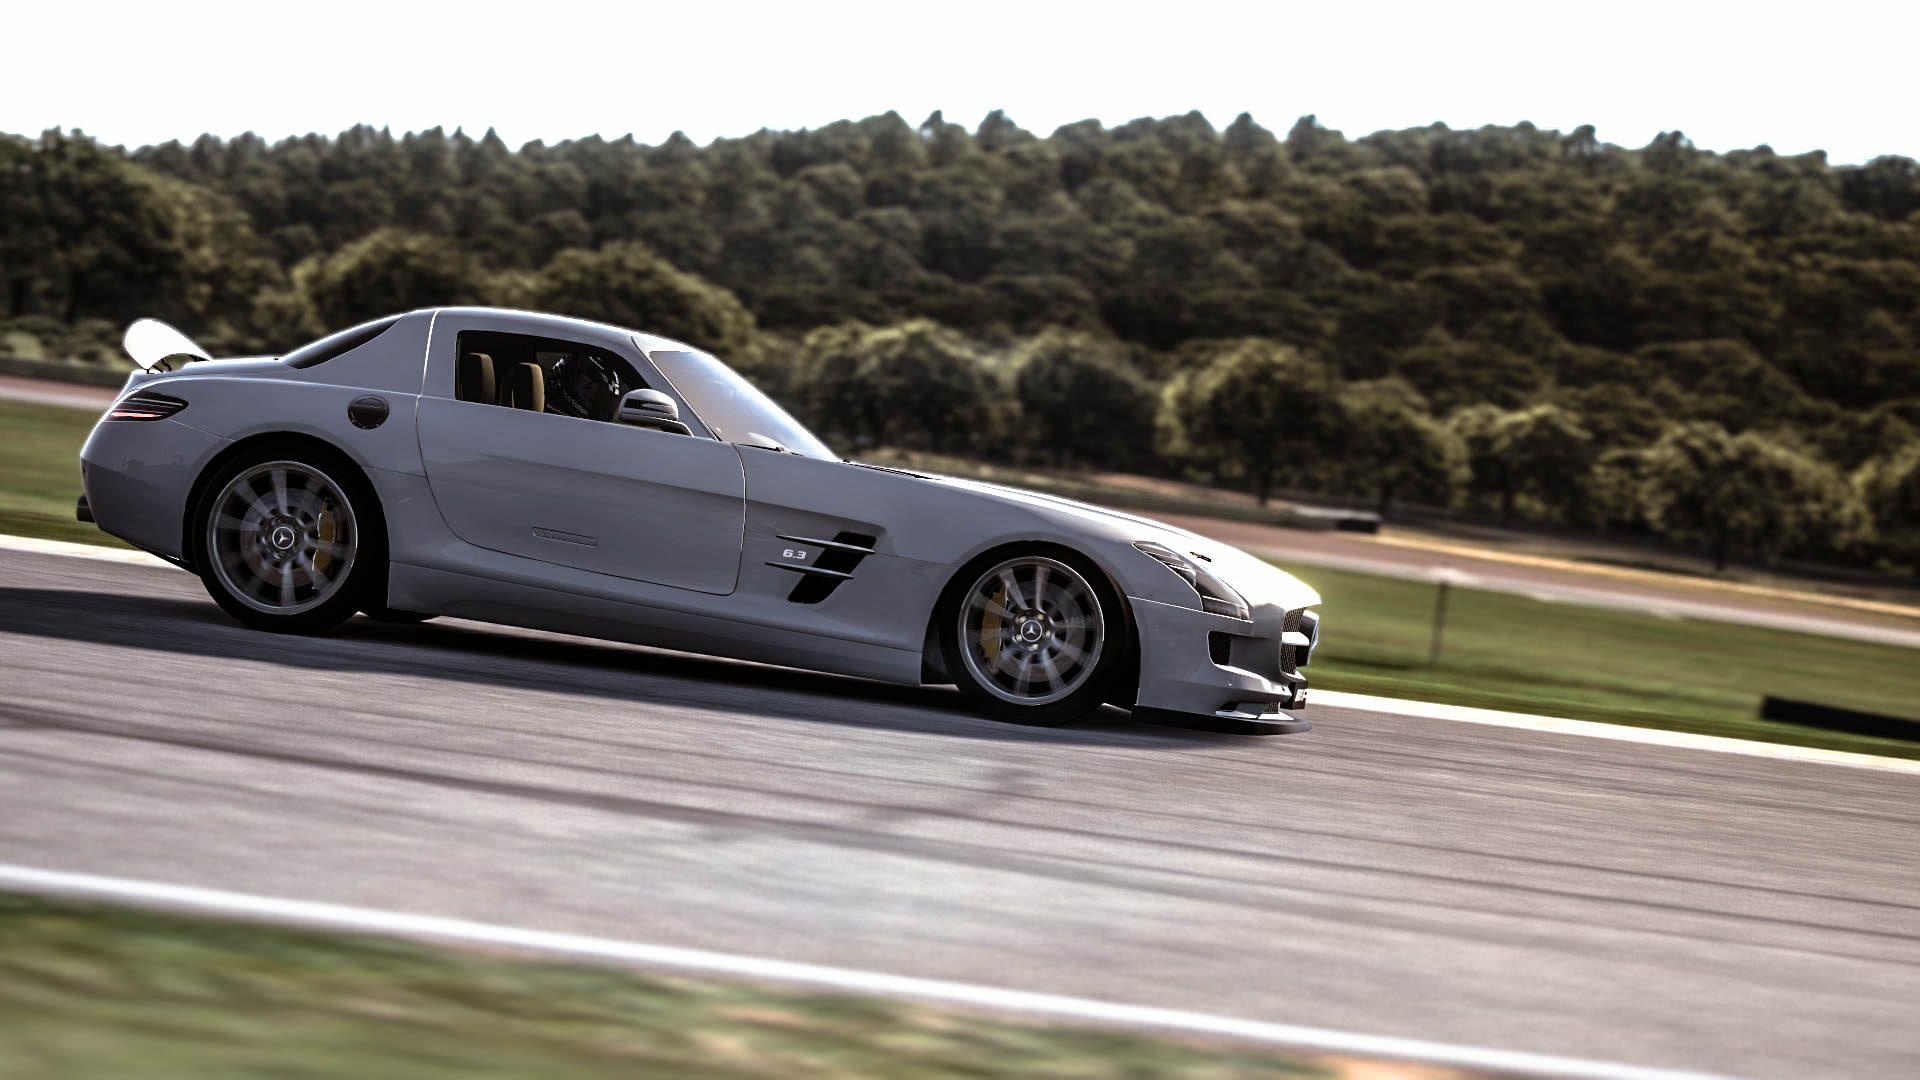 Mercedes_SLS_AMG_02.jpg